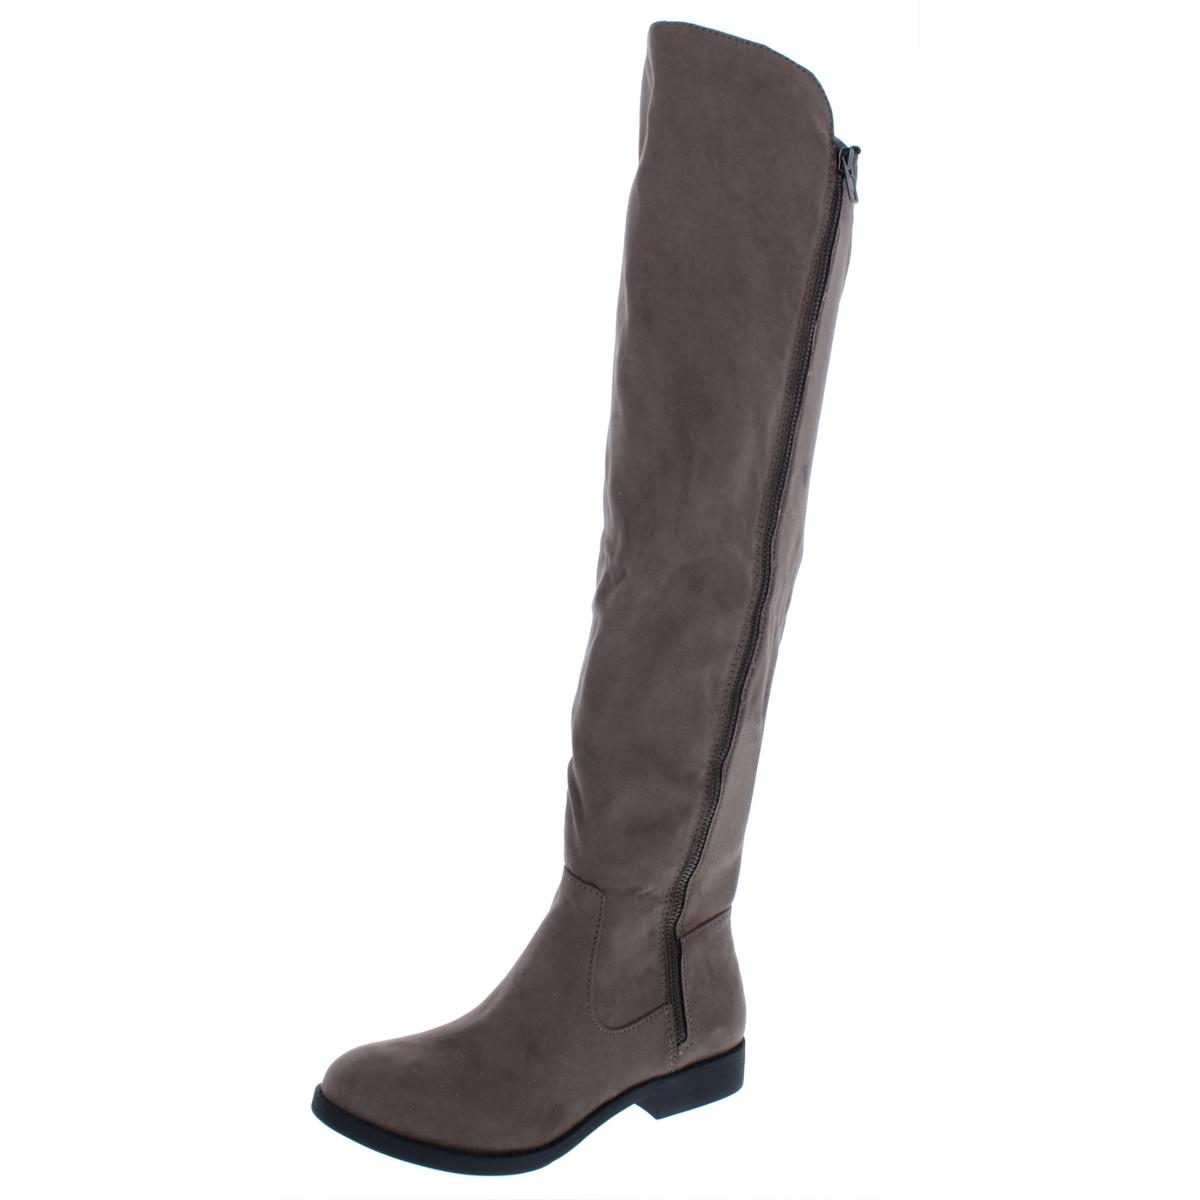 Style & Co. Damenschuhe Hadleyy Stiefel Wide Calf Fashion Over-The-Knee Stiefel Hadleyy Schuhes BHFO 6632 3b6db2